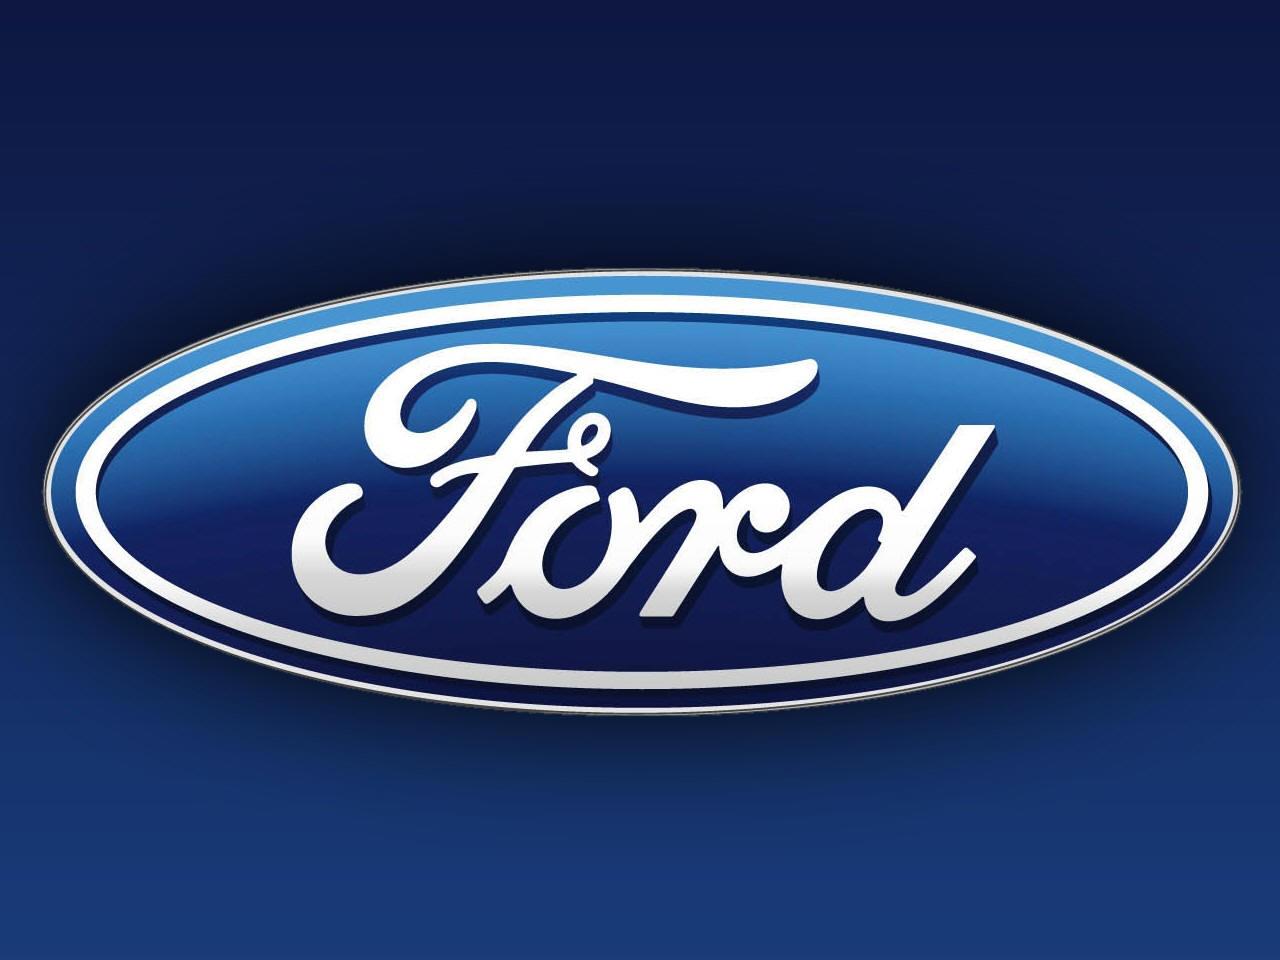 Ford Logo Auto Cars Concept